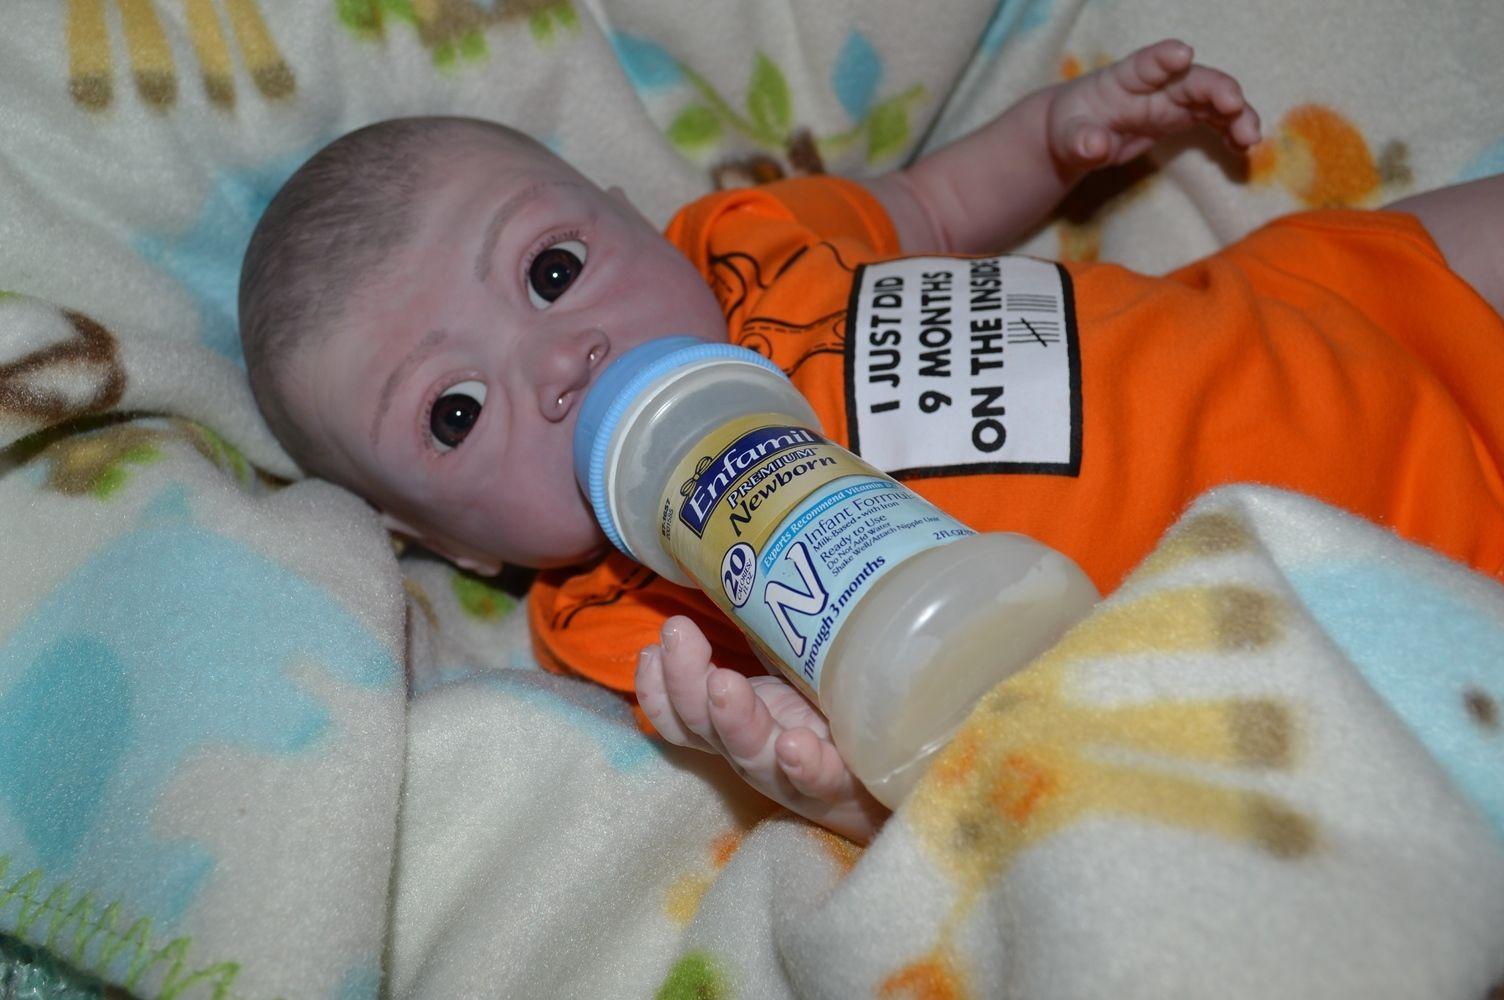 "Reborn  Baby  Ryan 19"" & 4 Lbs. ( 3 Day Auction ) https://t.co/l7KiN6CYY2 https://t.co/LmX41qKk6O"